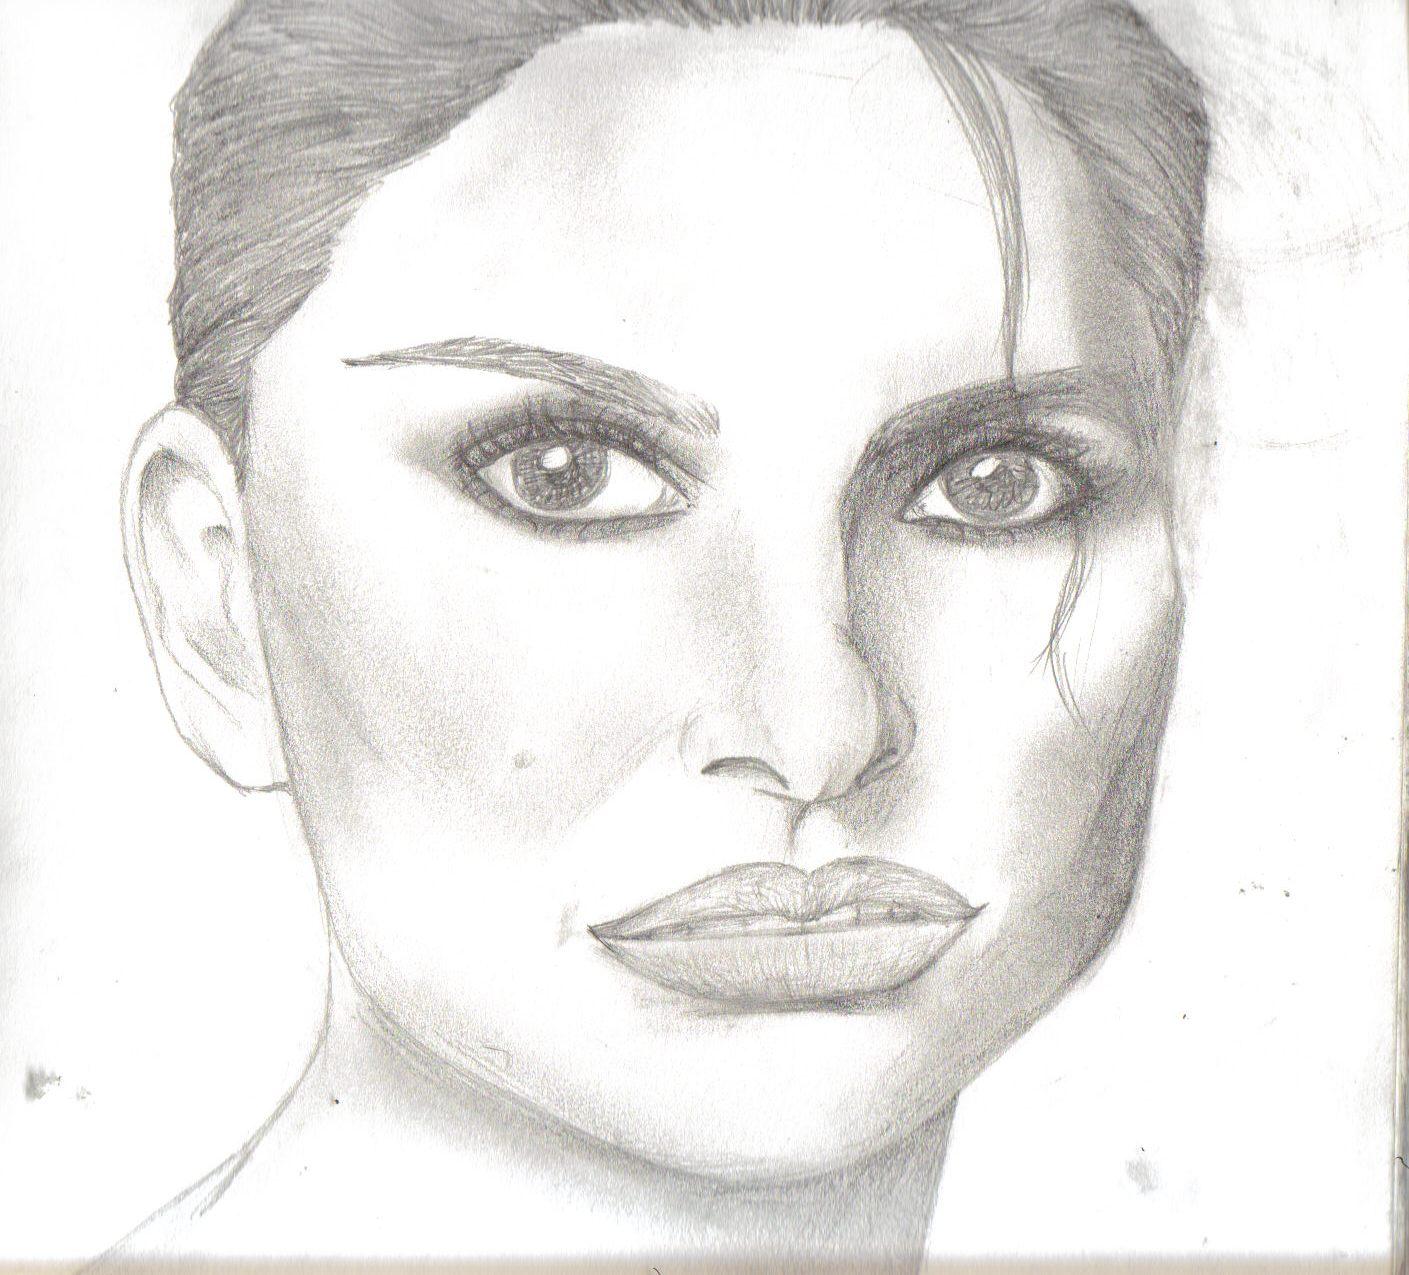 http://1.bp.blogspot.com/_KqXCR7JmkWM/TSaHFazuQ5I/AAAAAAAAAGs/ka9XhqthuD8/s1600/n+portman.jpg